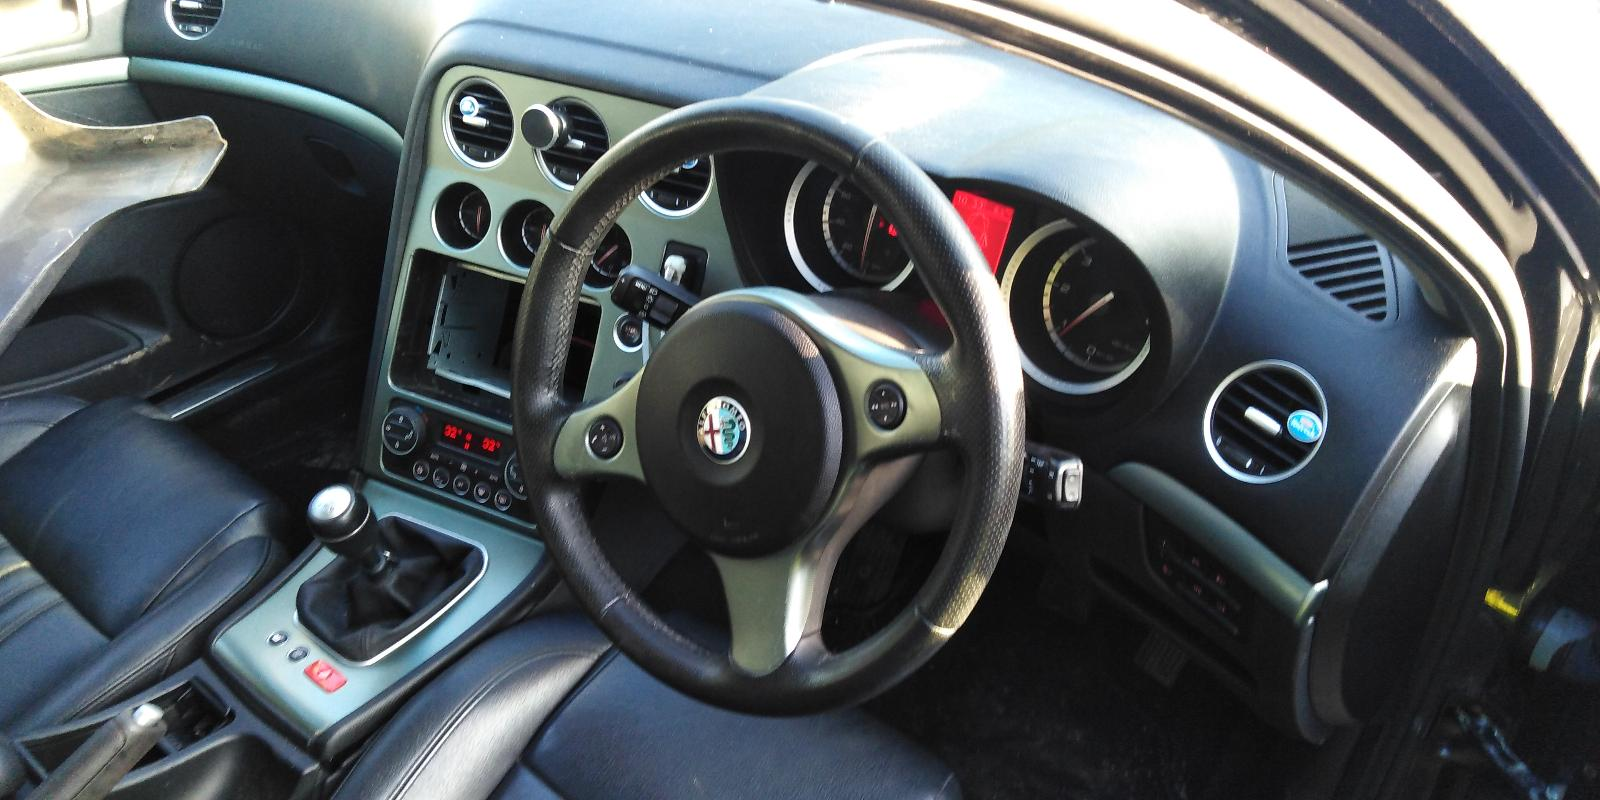 View Auto part ALFA ROMEO 159 2008 4 Door Saloon